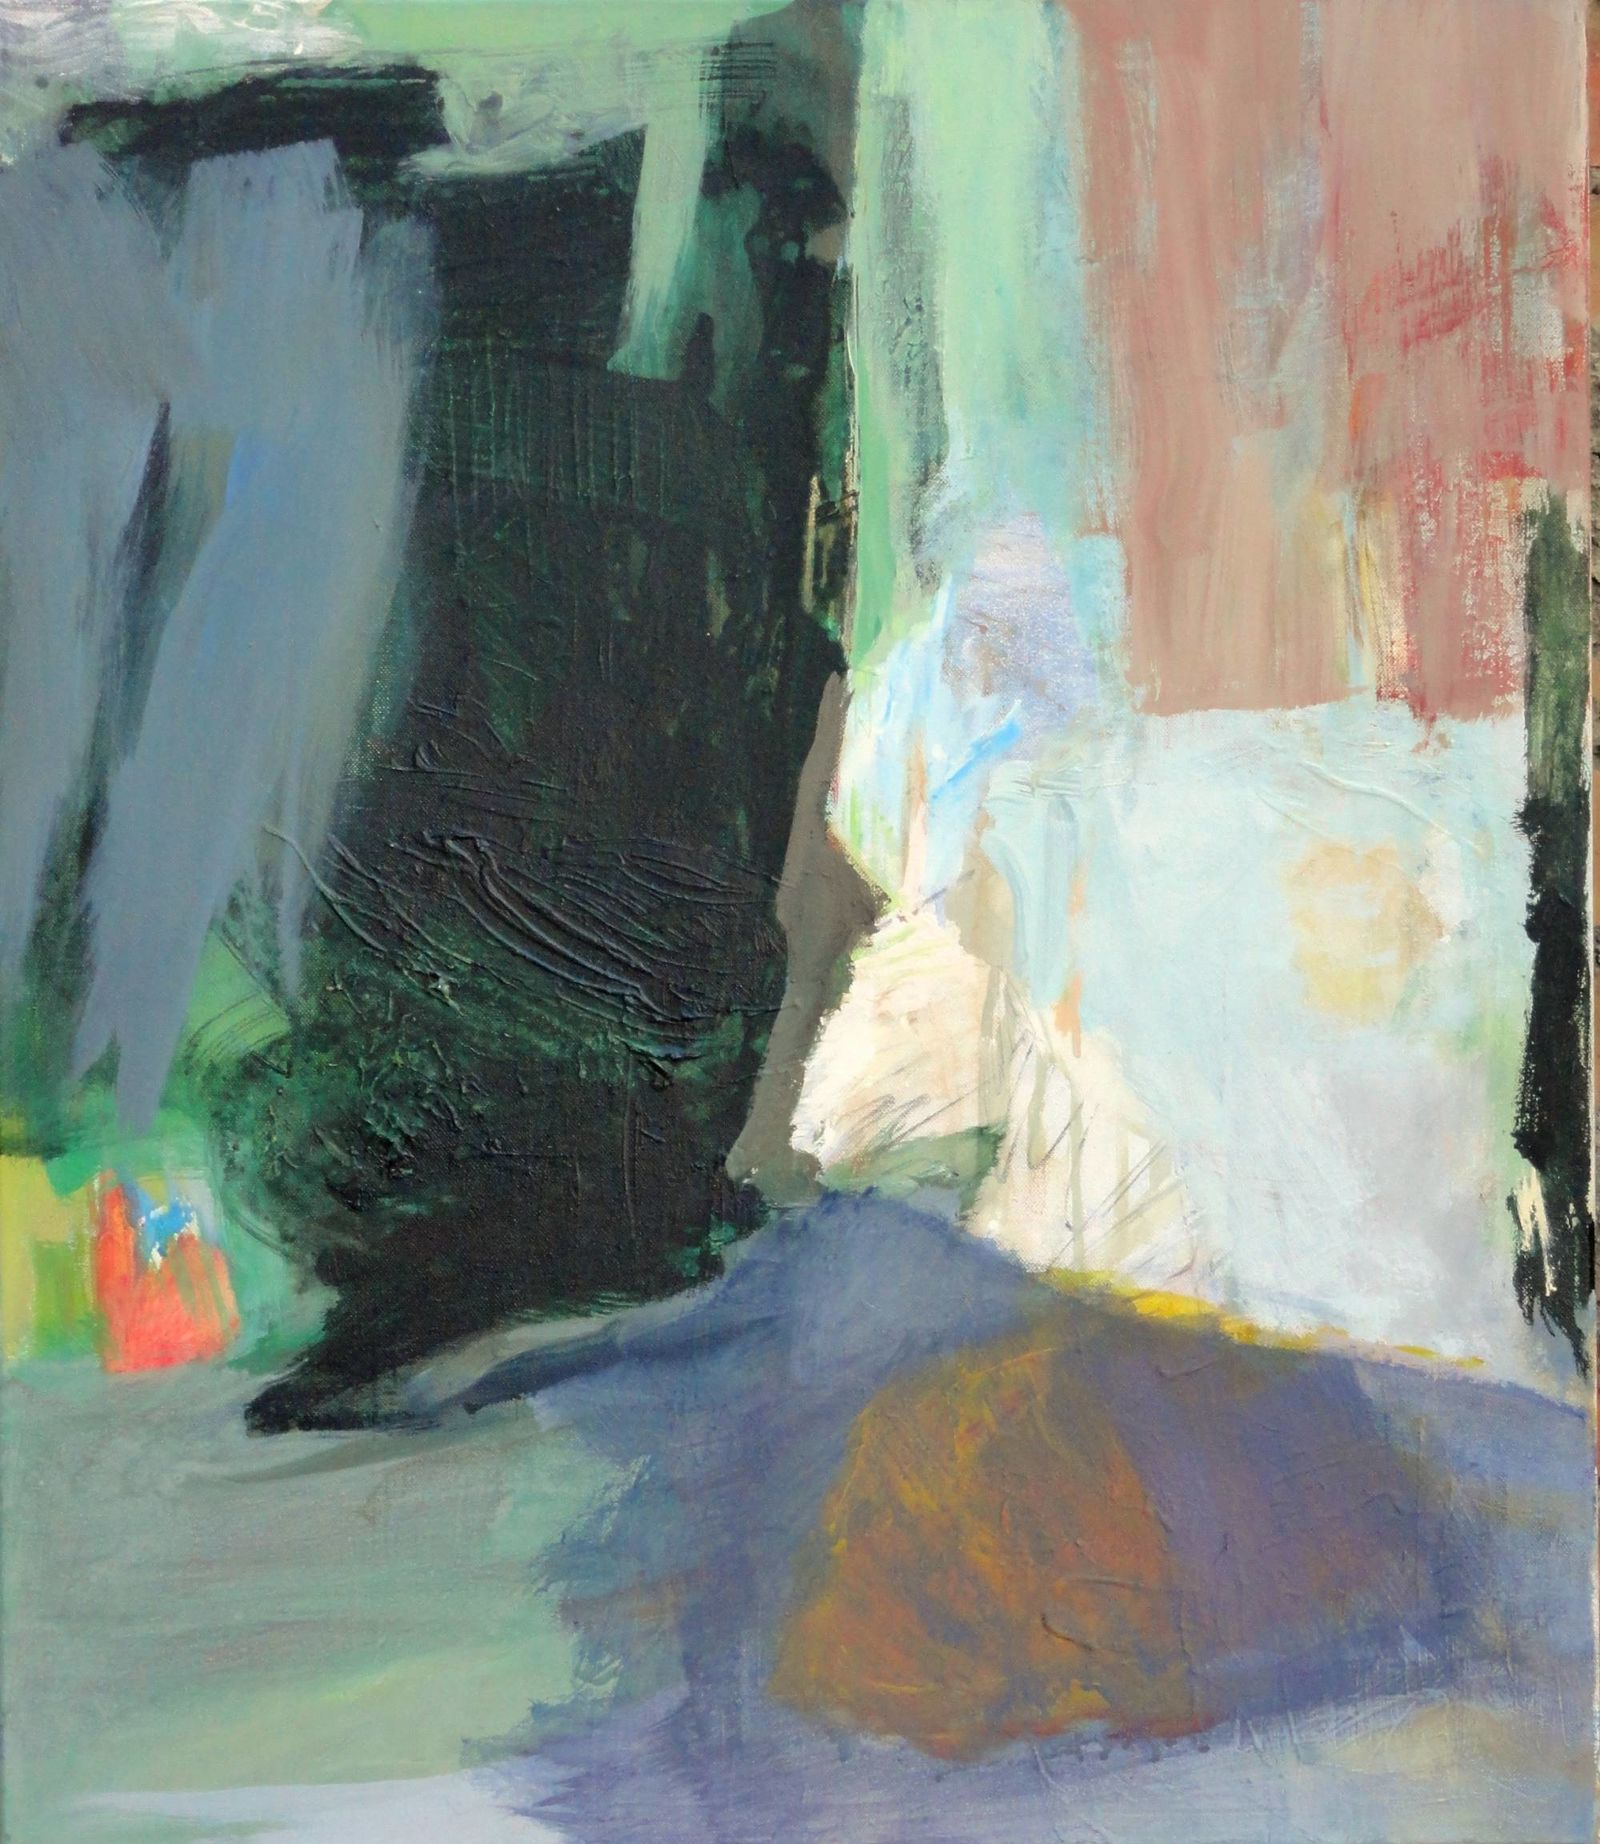 """Atemwende"", 2015. Acryl auf Leinwand, 70 x 60 cm"